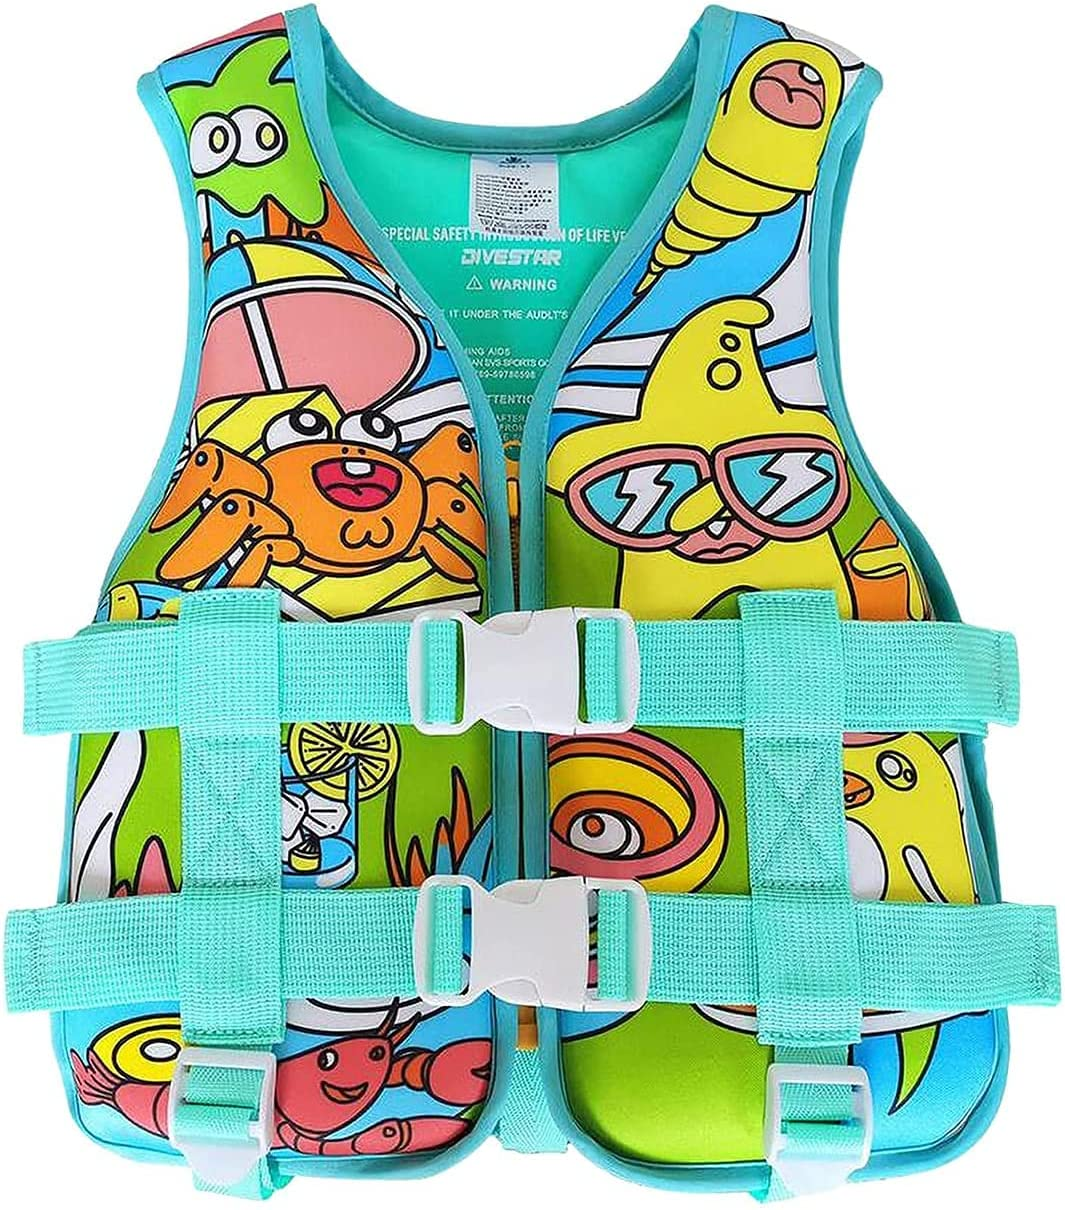 DLRBDMM Kids Life Jacket Youth Sales Safety Swimming Swimsuit Cheap bargain Swimwear